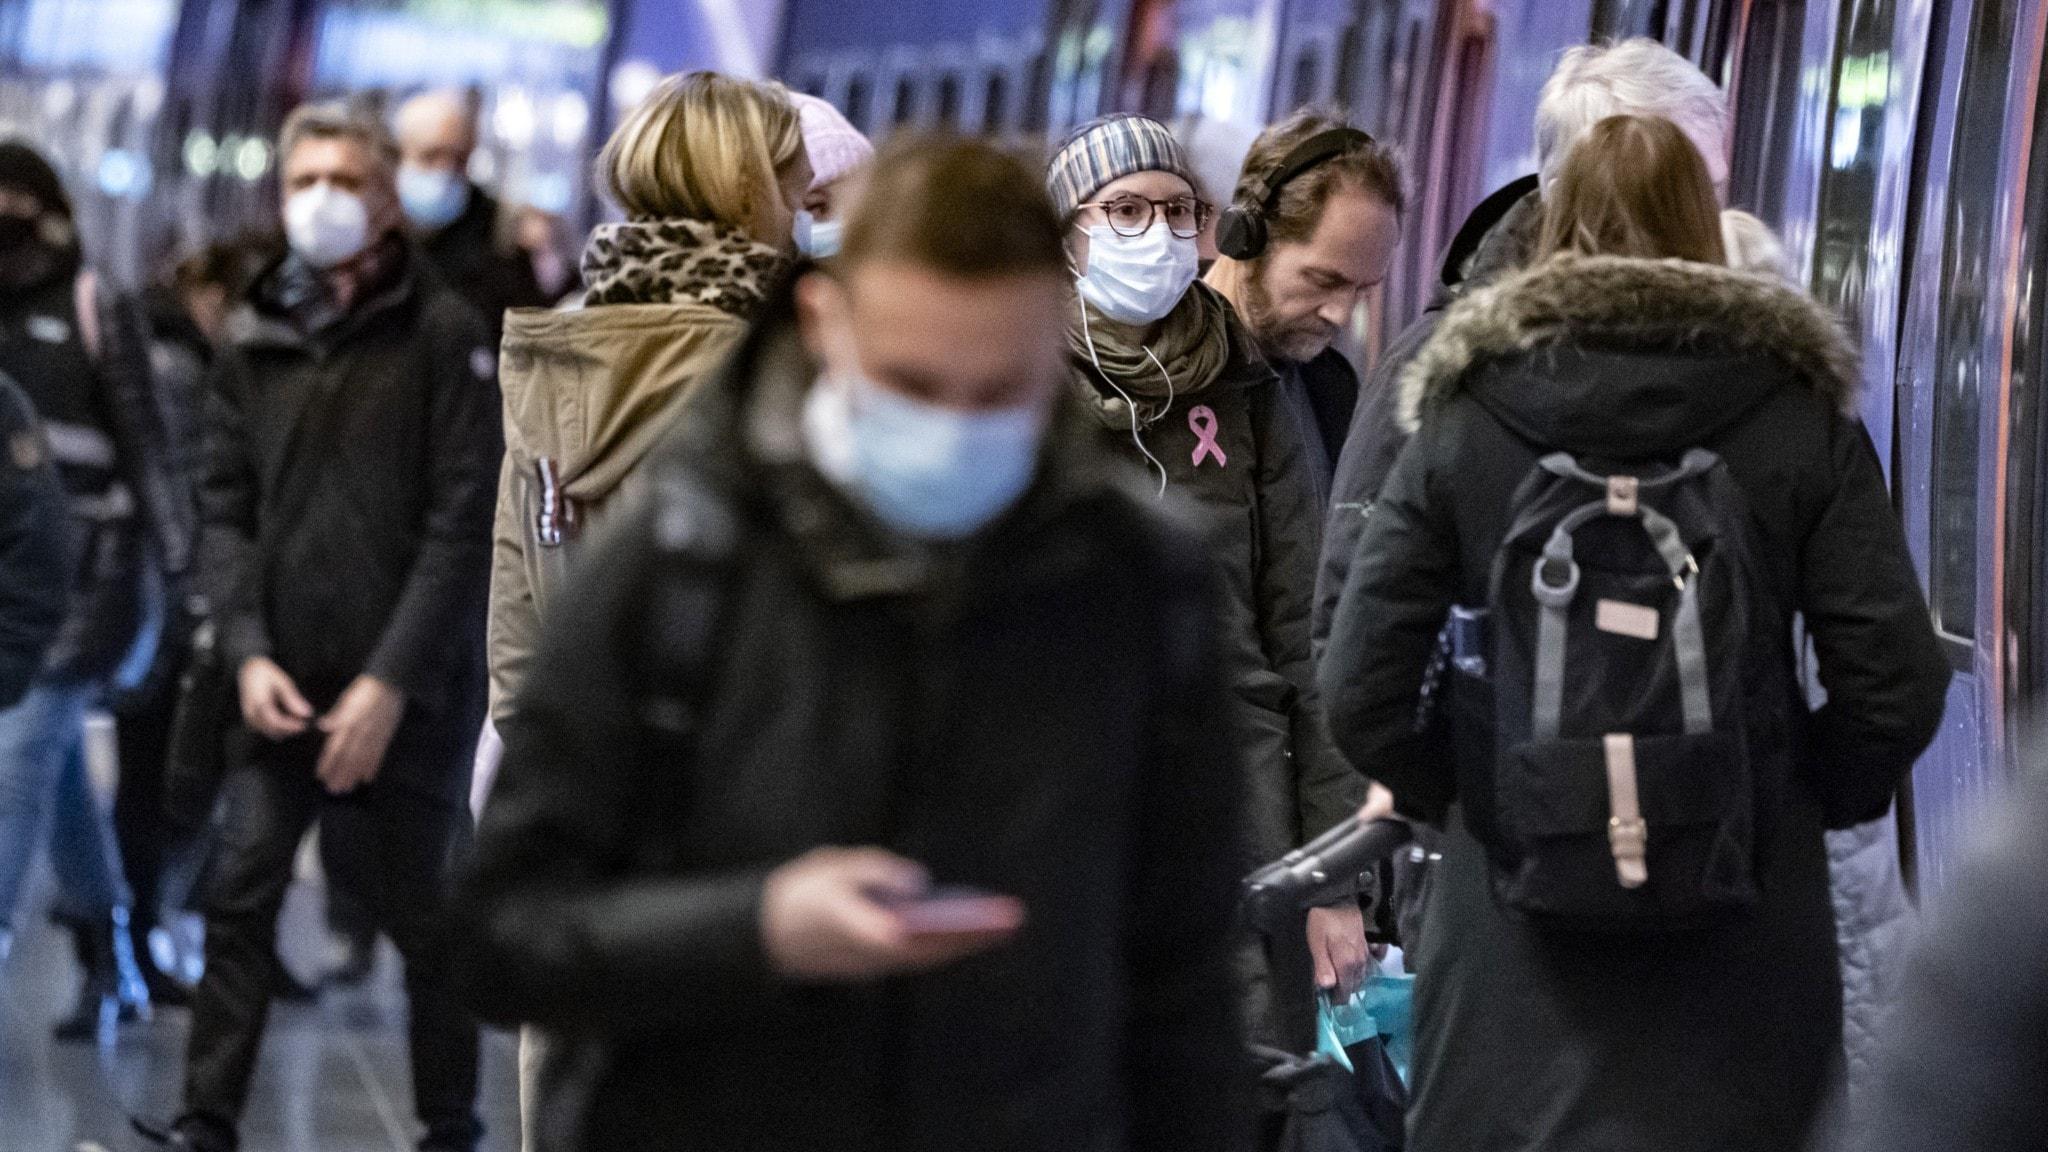 A person wearing a face masks on a subway platform.